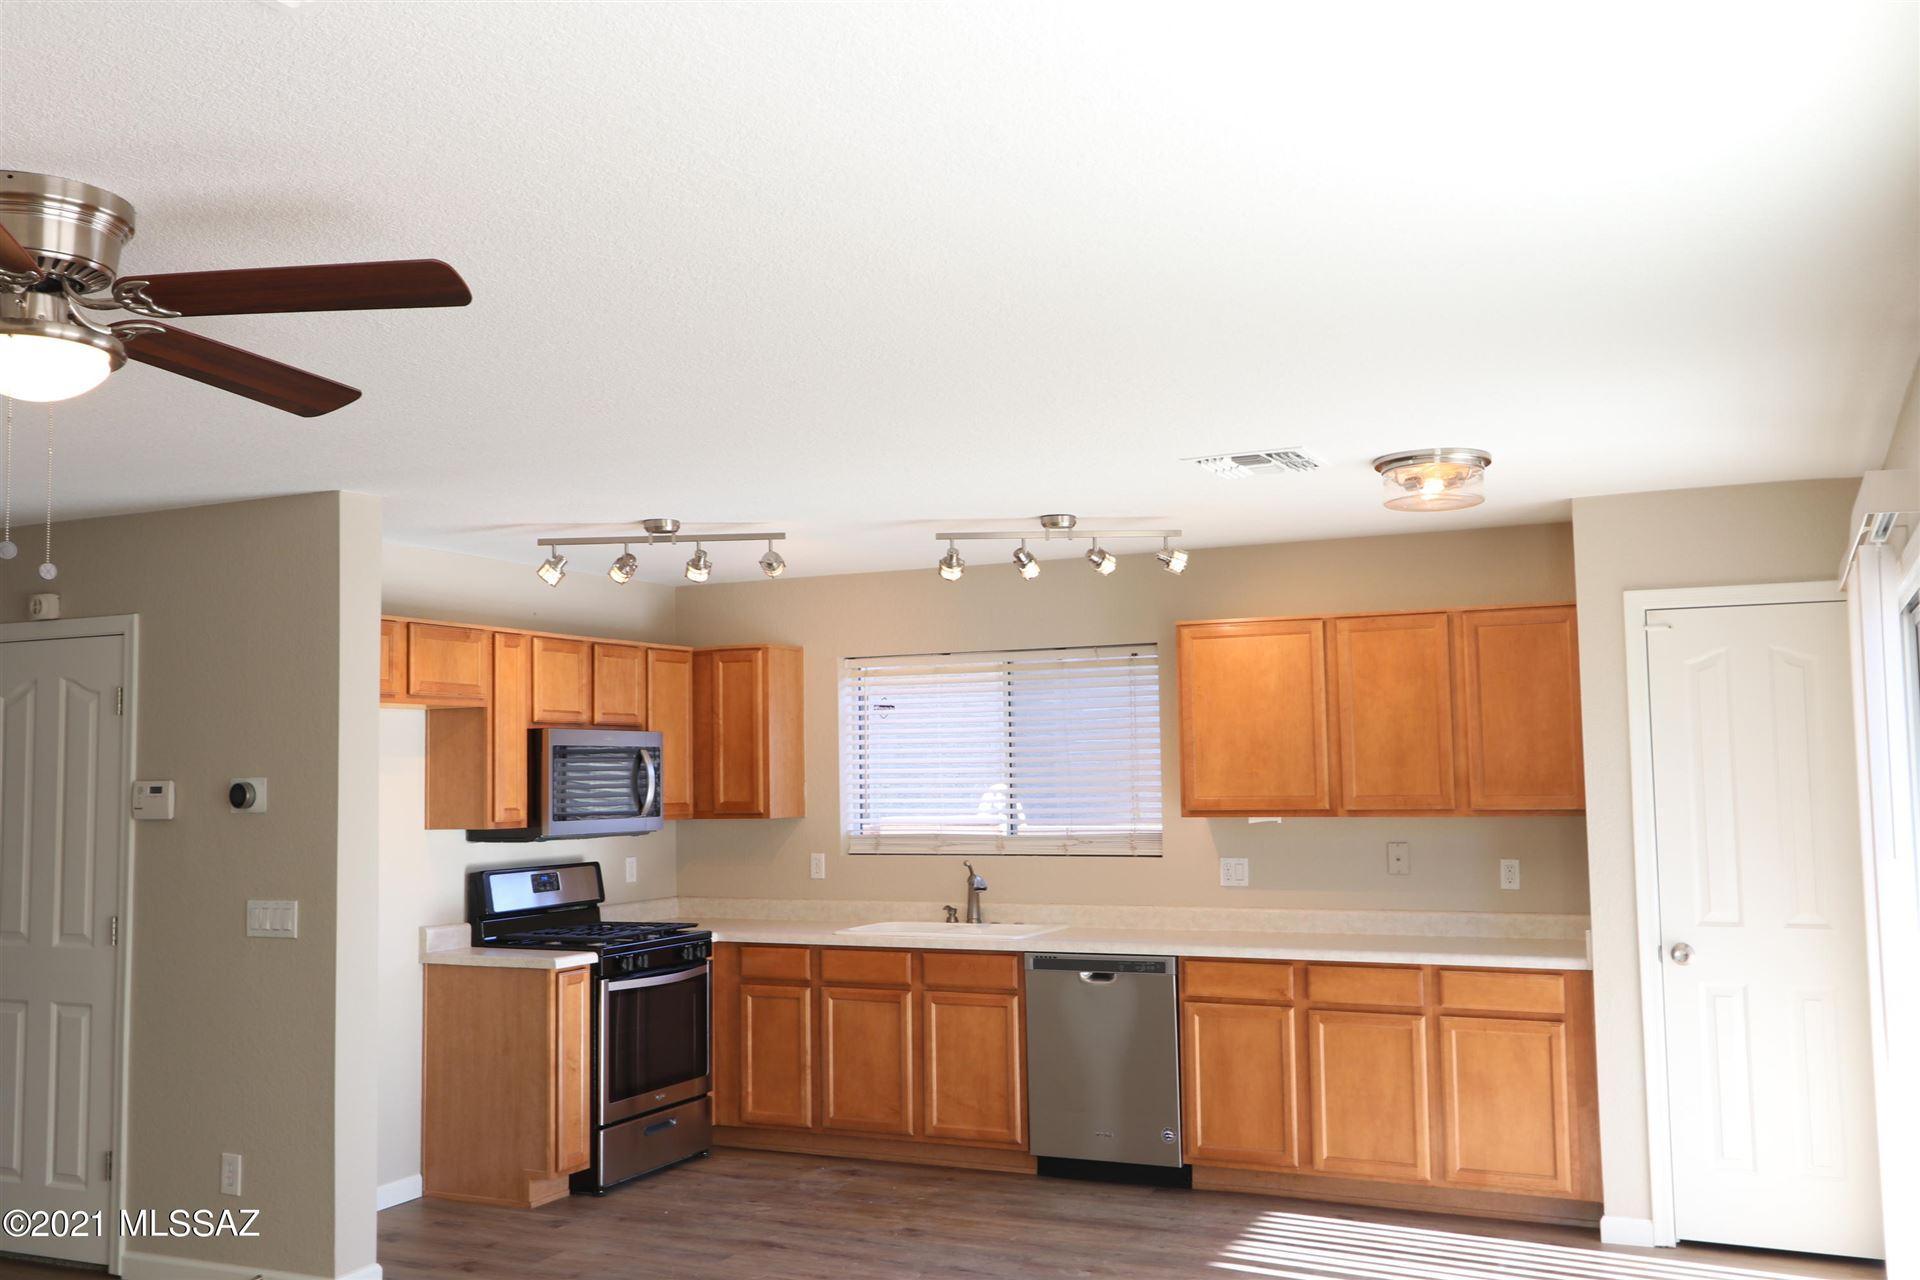 7759 W Oak Stream Road, Tucson, AZ 85743 - MLS#: 22100716